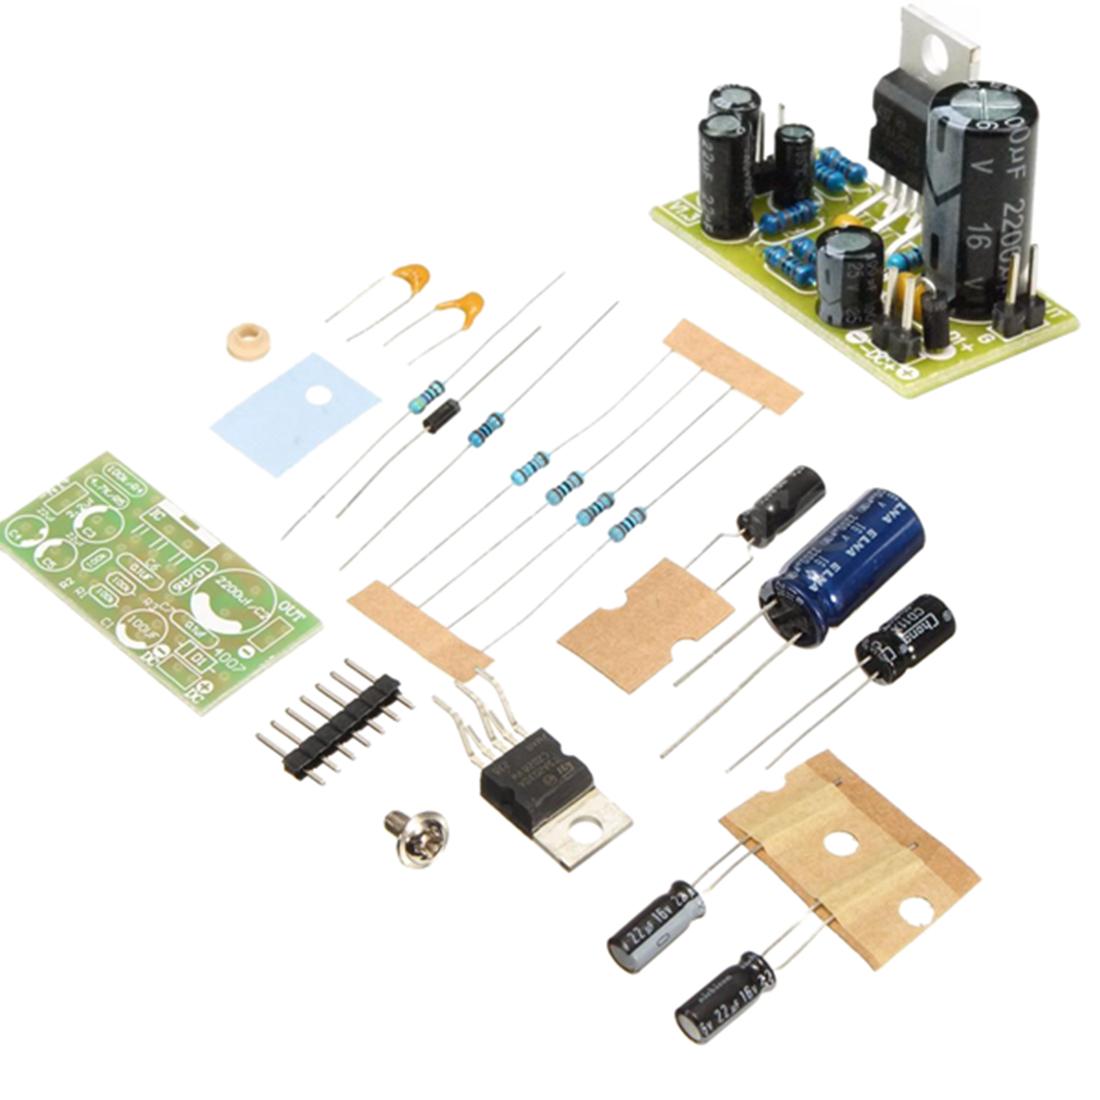 tda2030a audio power amplifier board module mono stereo amp subwoofer diy c1w4. Black Bedroom Furniture Sets. Home Design Ideas